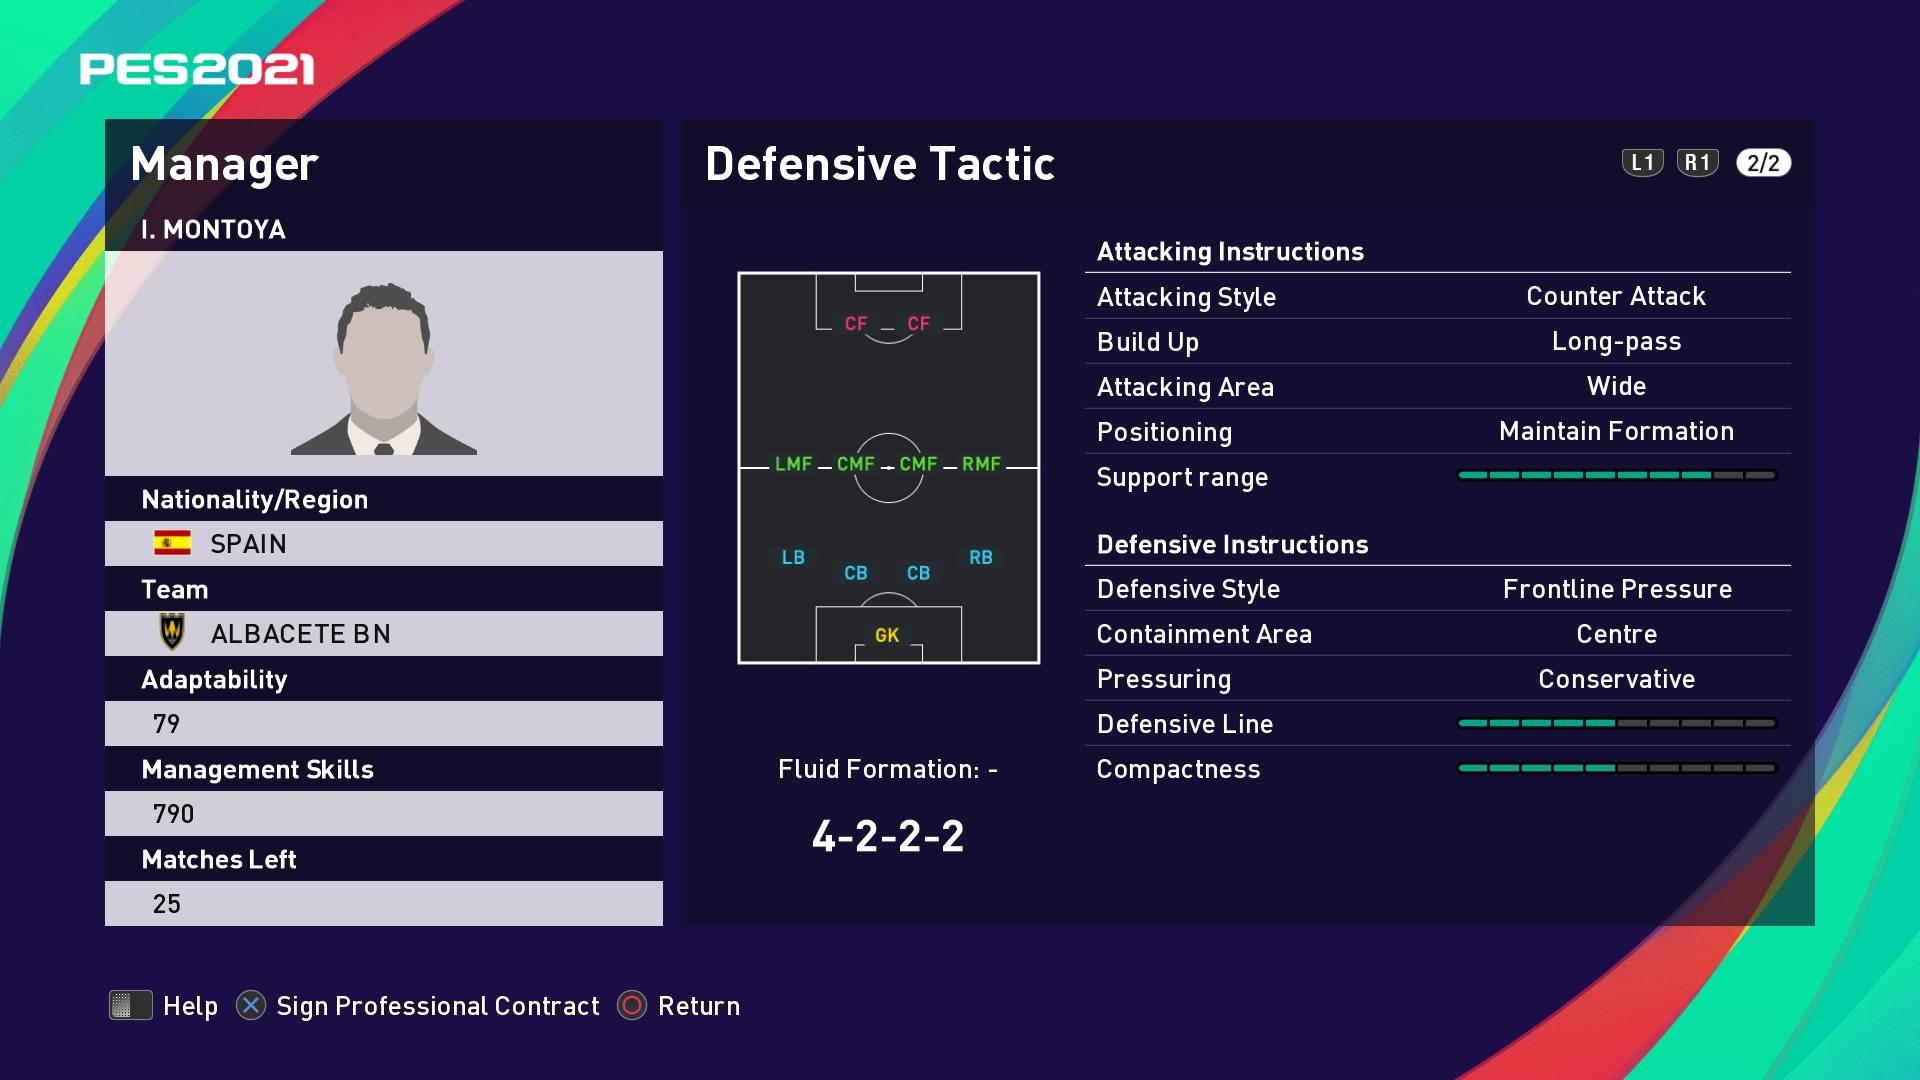 I. Montoya (Luis Miguel Ramis) Defensive Tactic in PES 2021 myClub